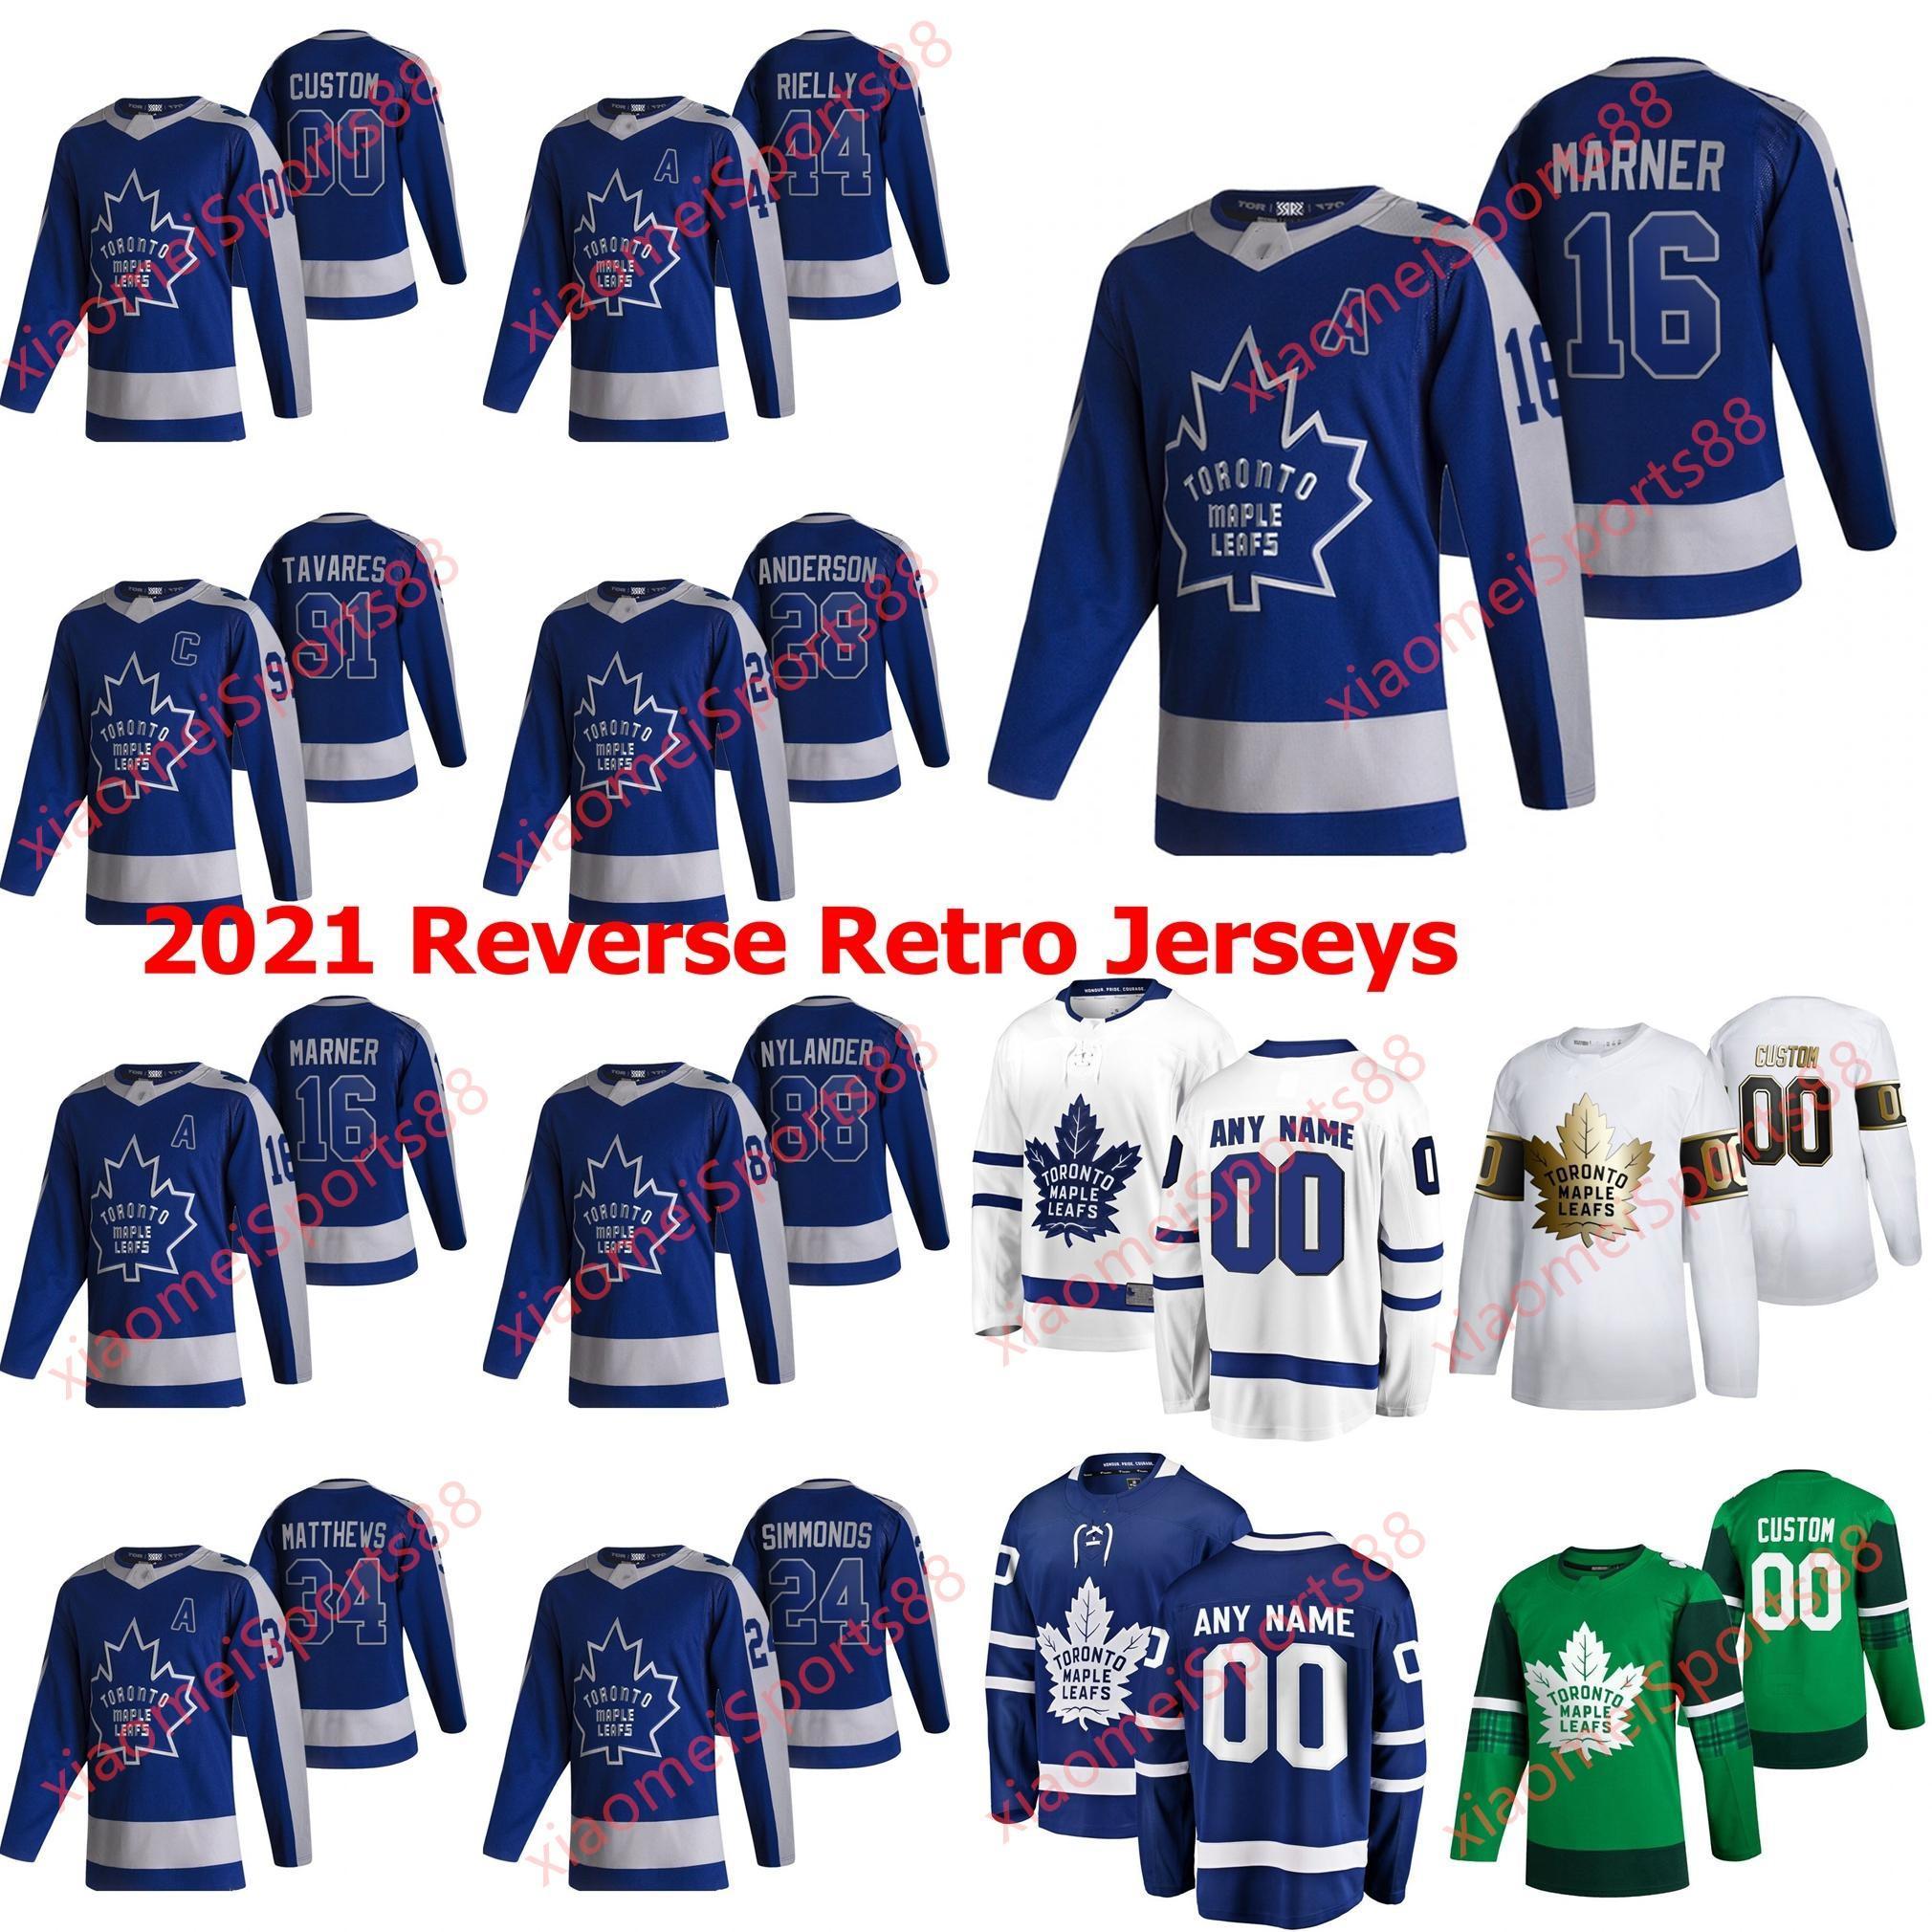 Toronto Maple Leafs 2021 Retro Retro Hockey Jerseys Michael Hutchinson Jersey Max Veronneau Denis Malgin Kyle Clifford Custom Steinsted